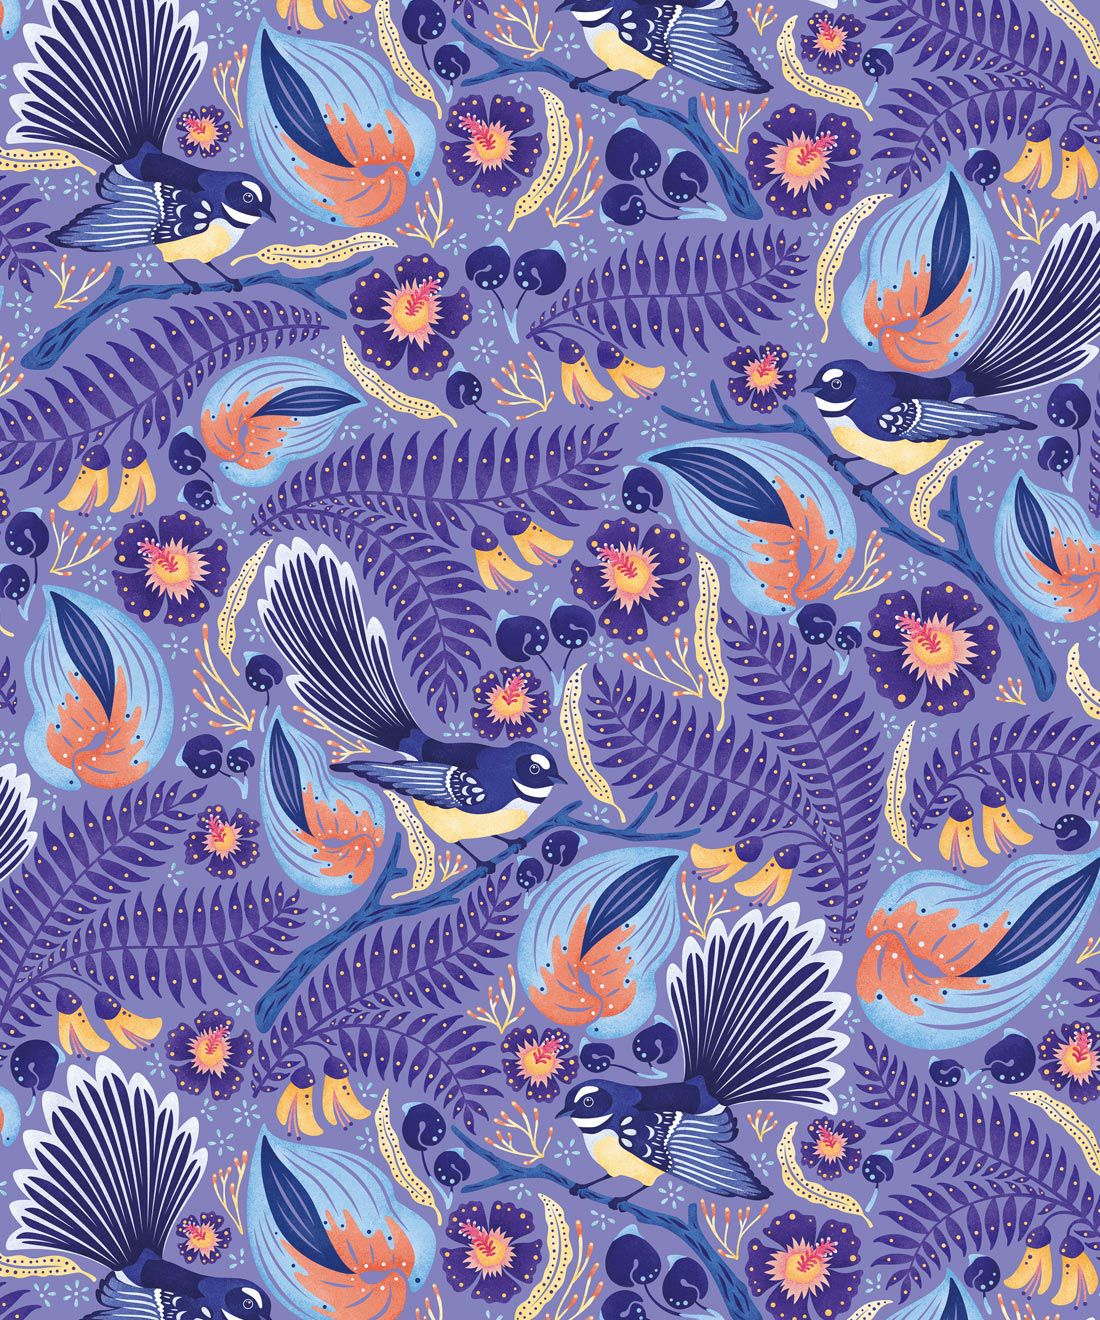 Faintails Wallpaper • New Zealand • Bird Wallpaper • Kowhai Tree • Kowhai Flowers • Blue Purple Wallpaper • Original Colorway